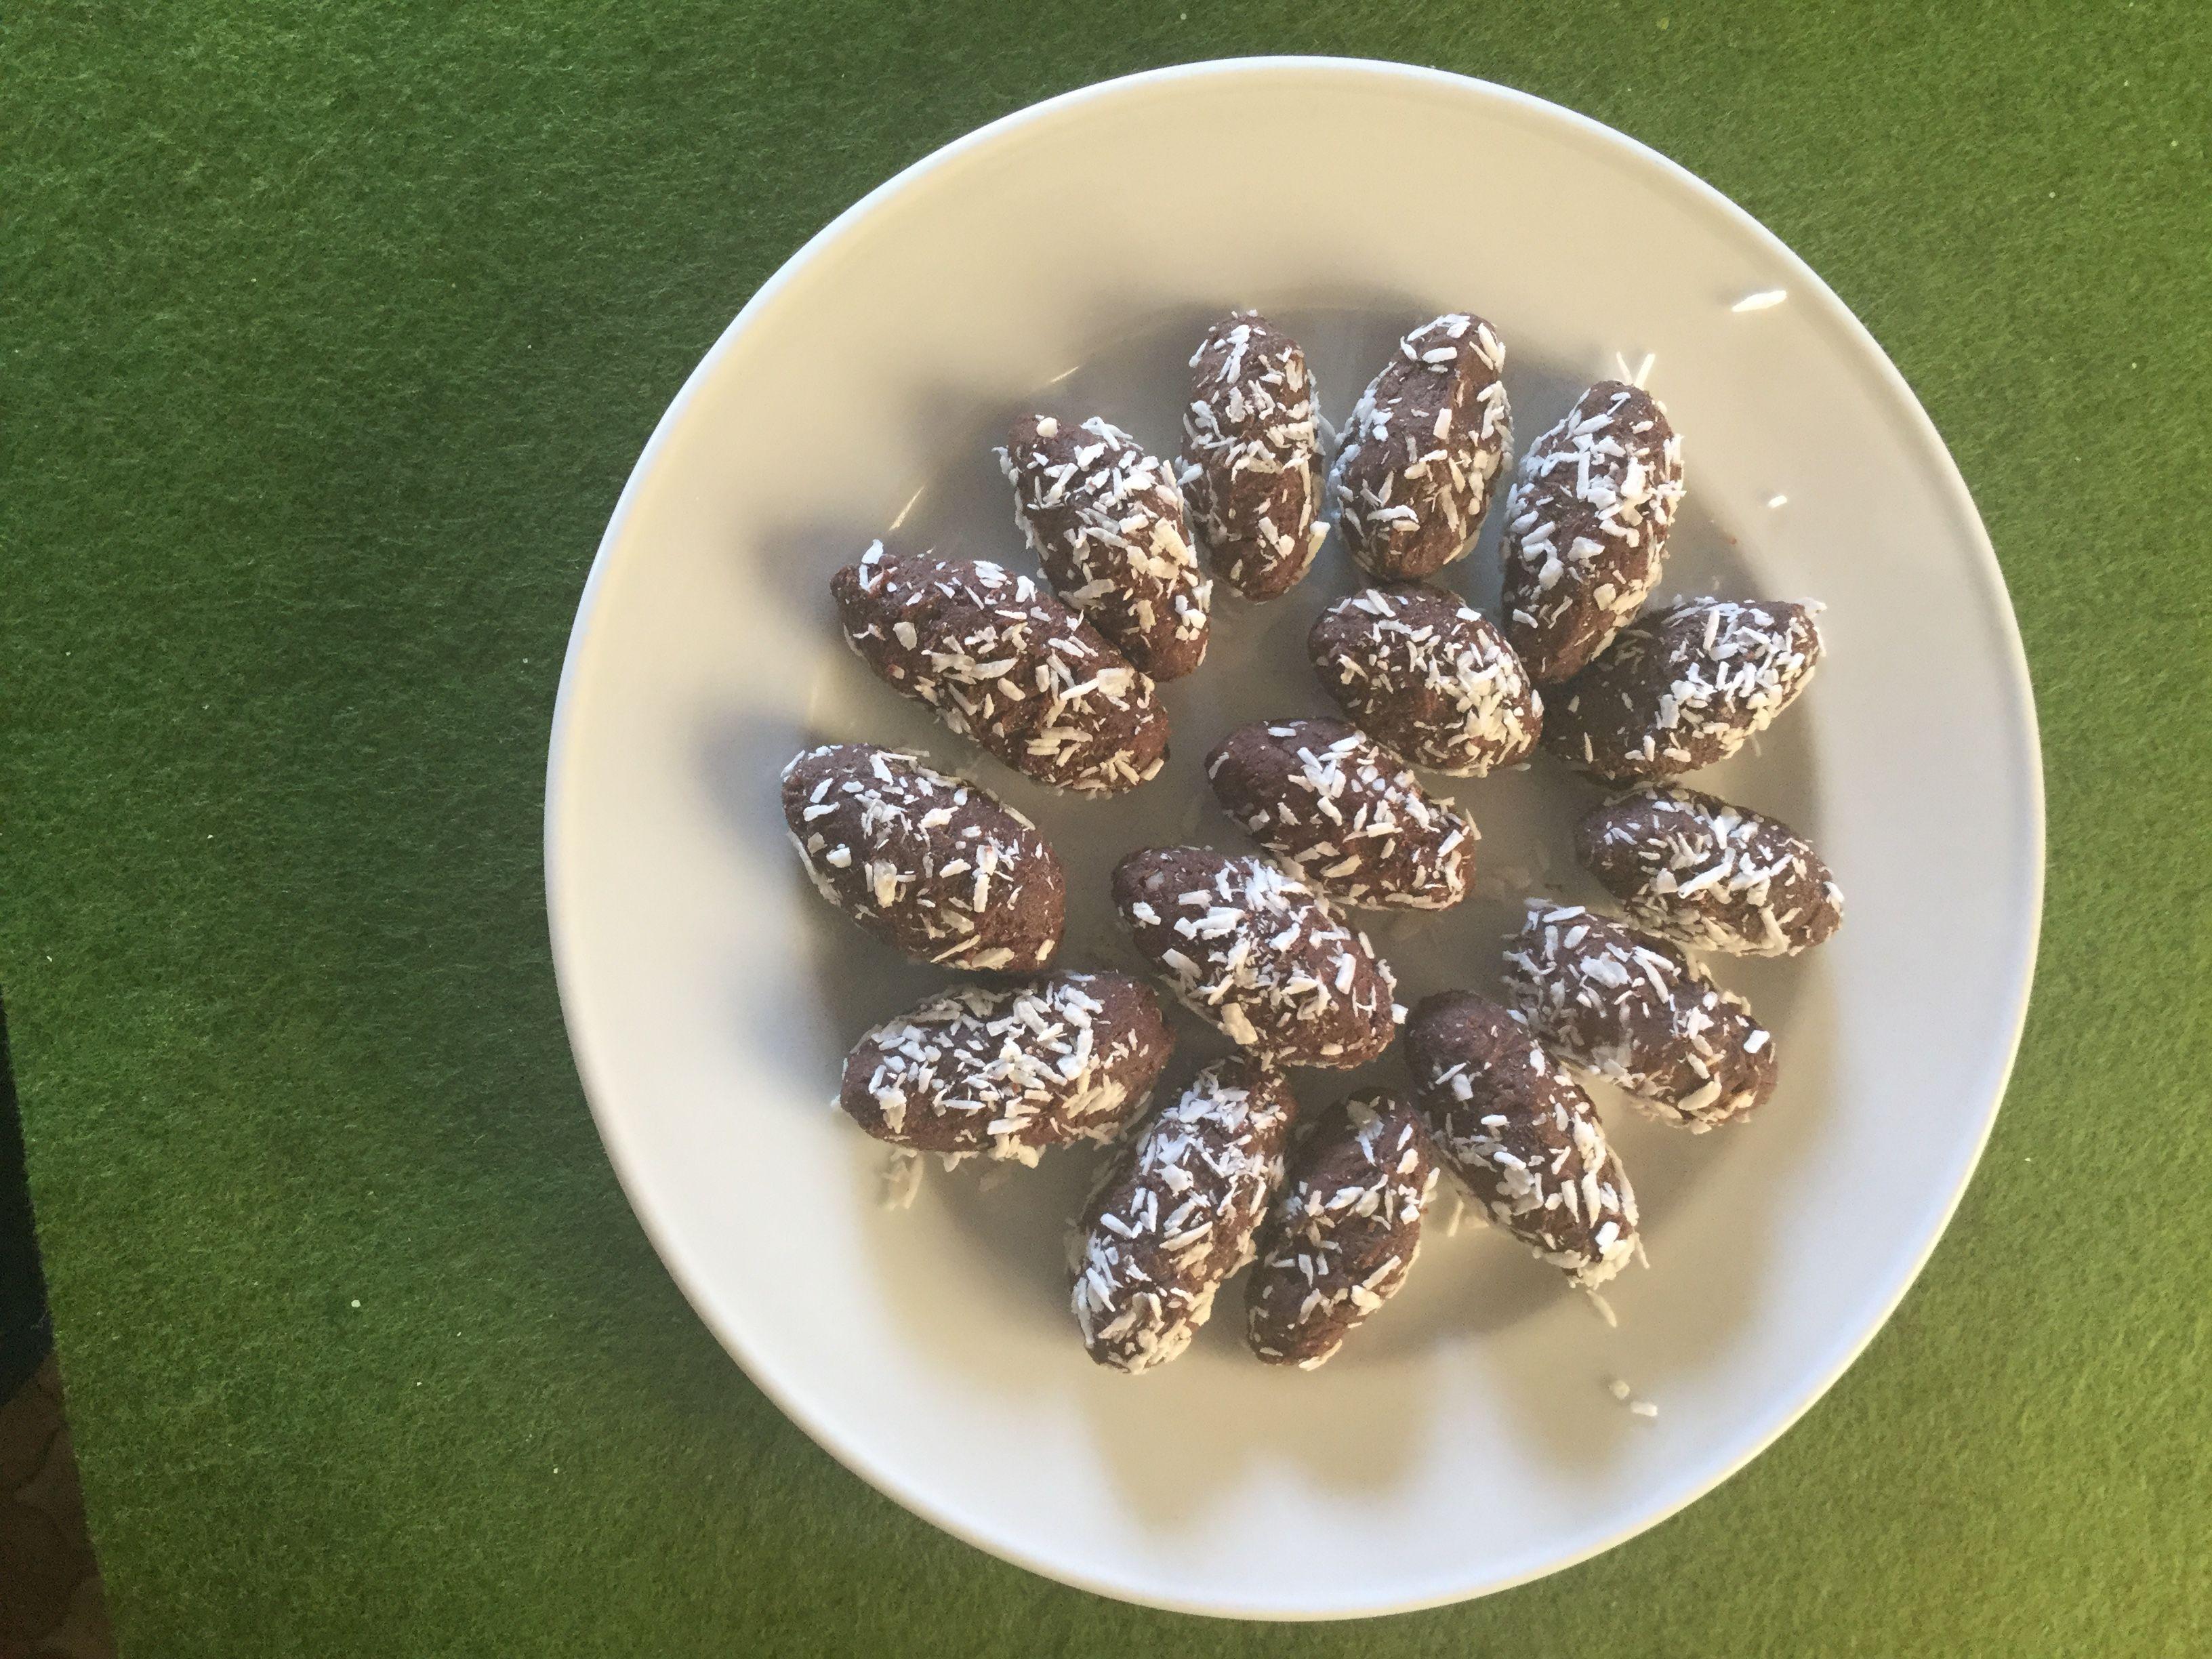 Homemade Chocolate Easter Eggs